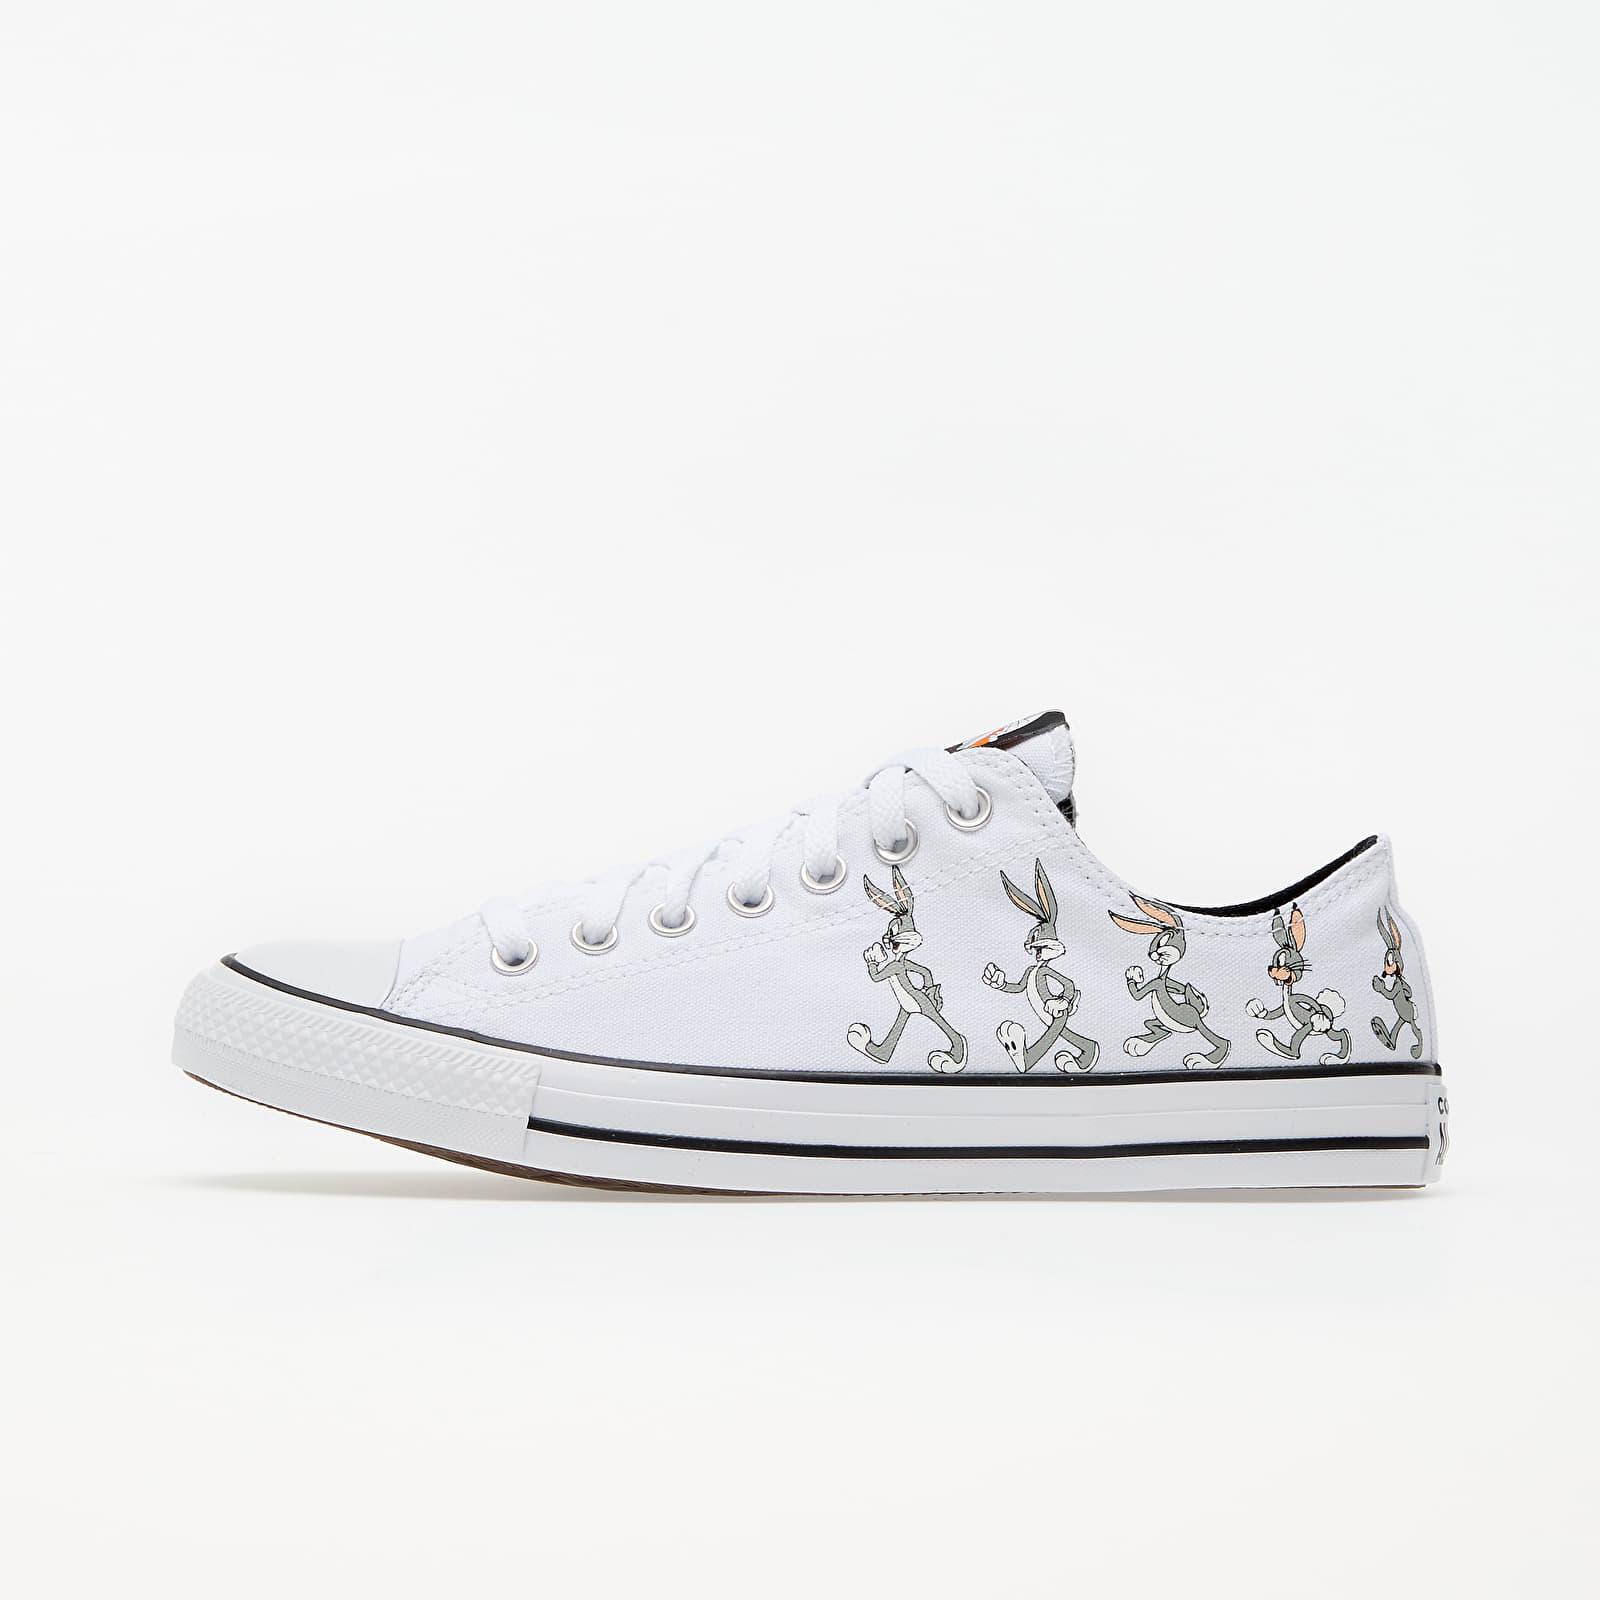 Converse x Bugs Bunny Chuck Taylor All Star OX Grey/ White 169226C